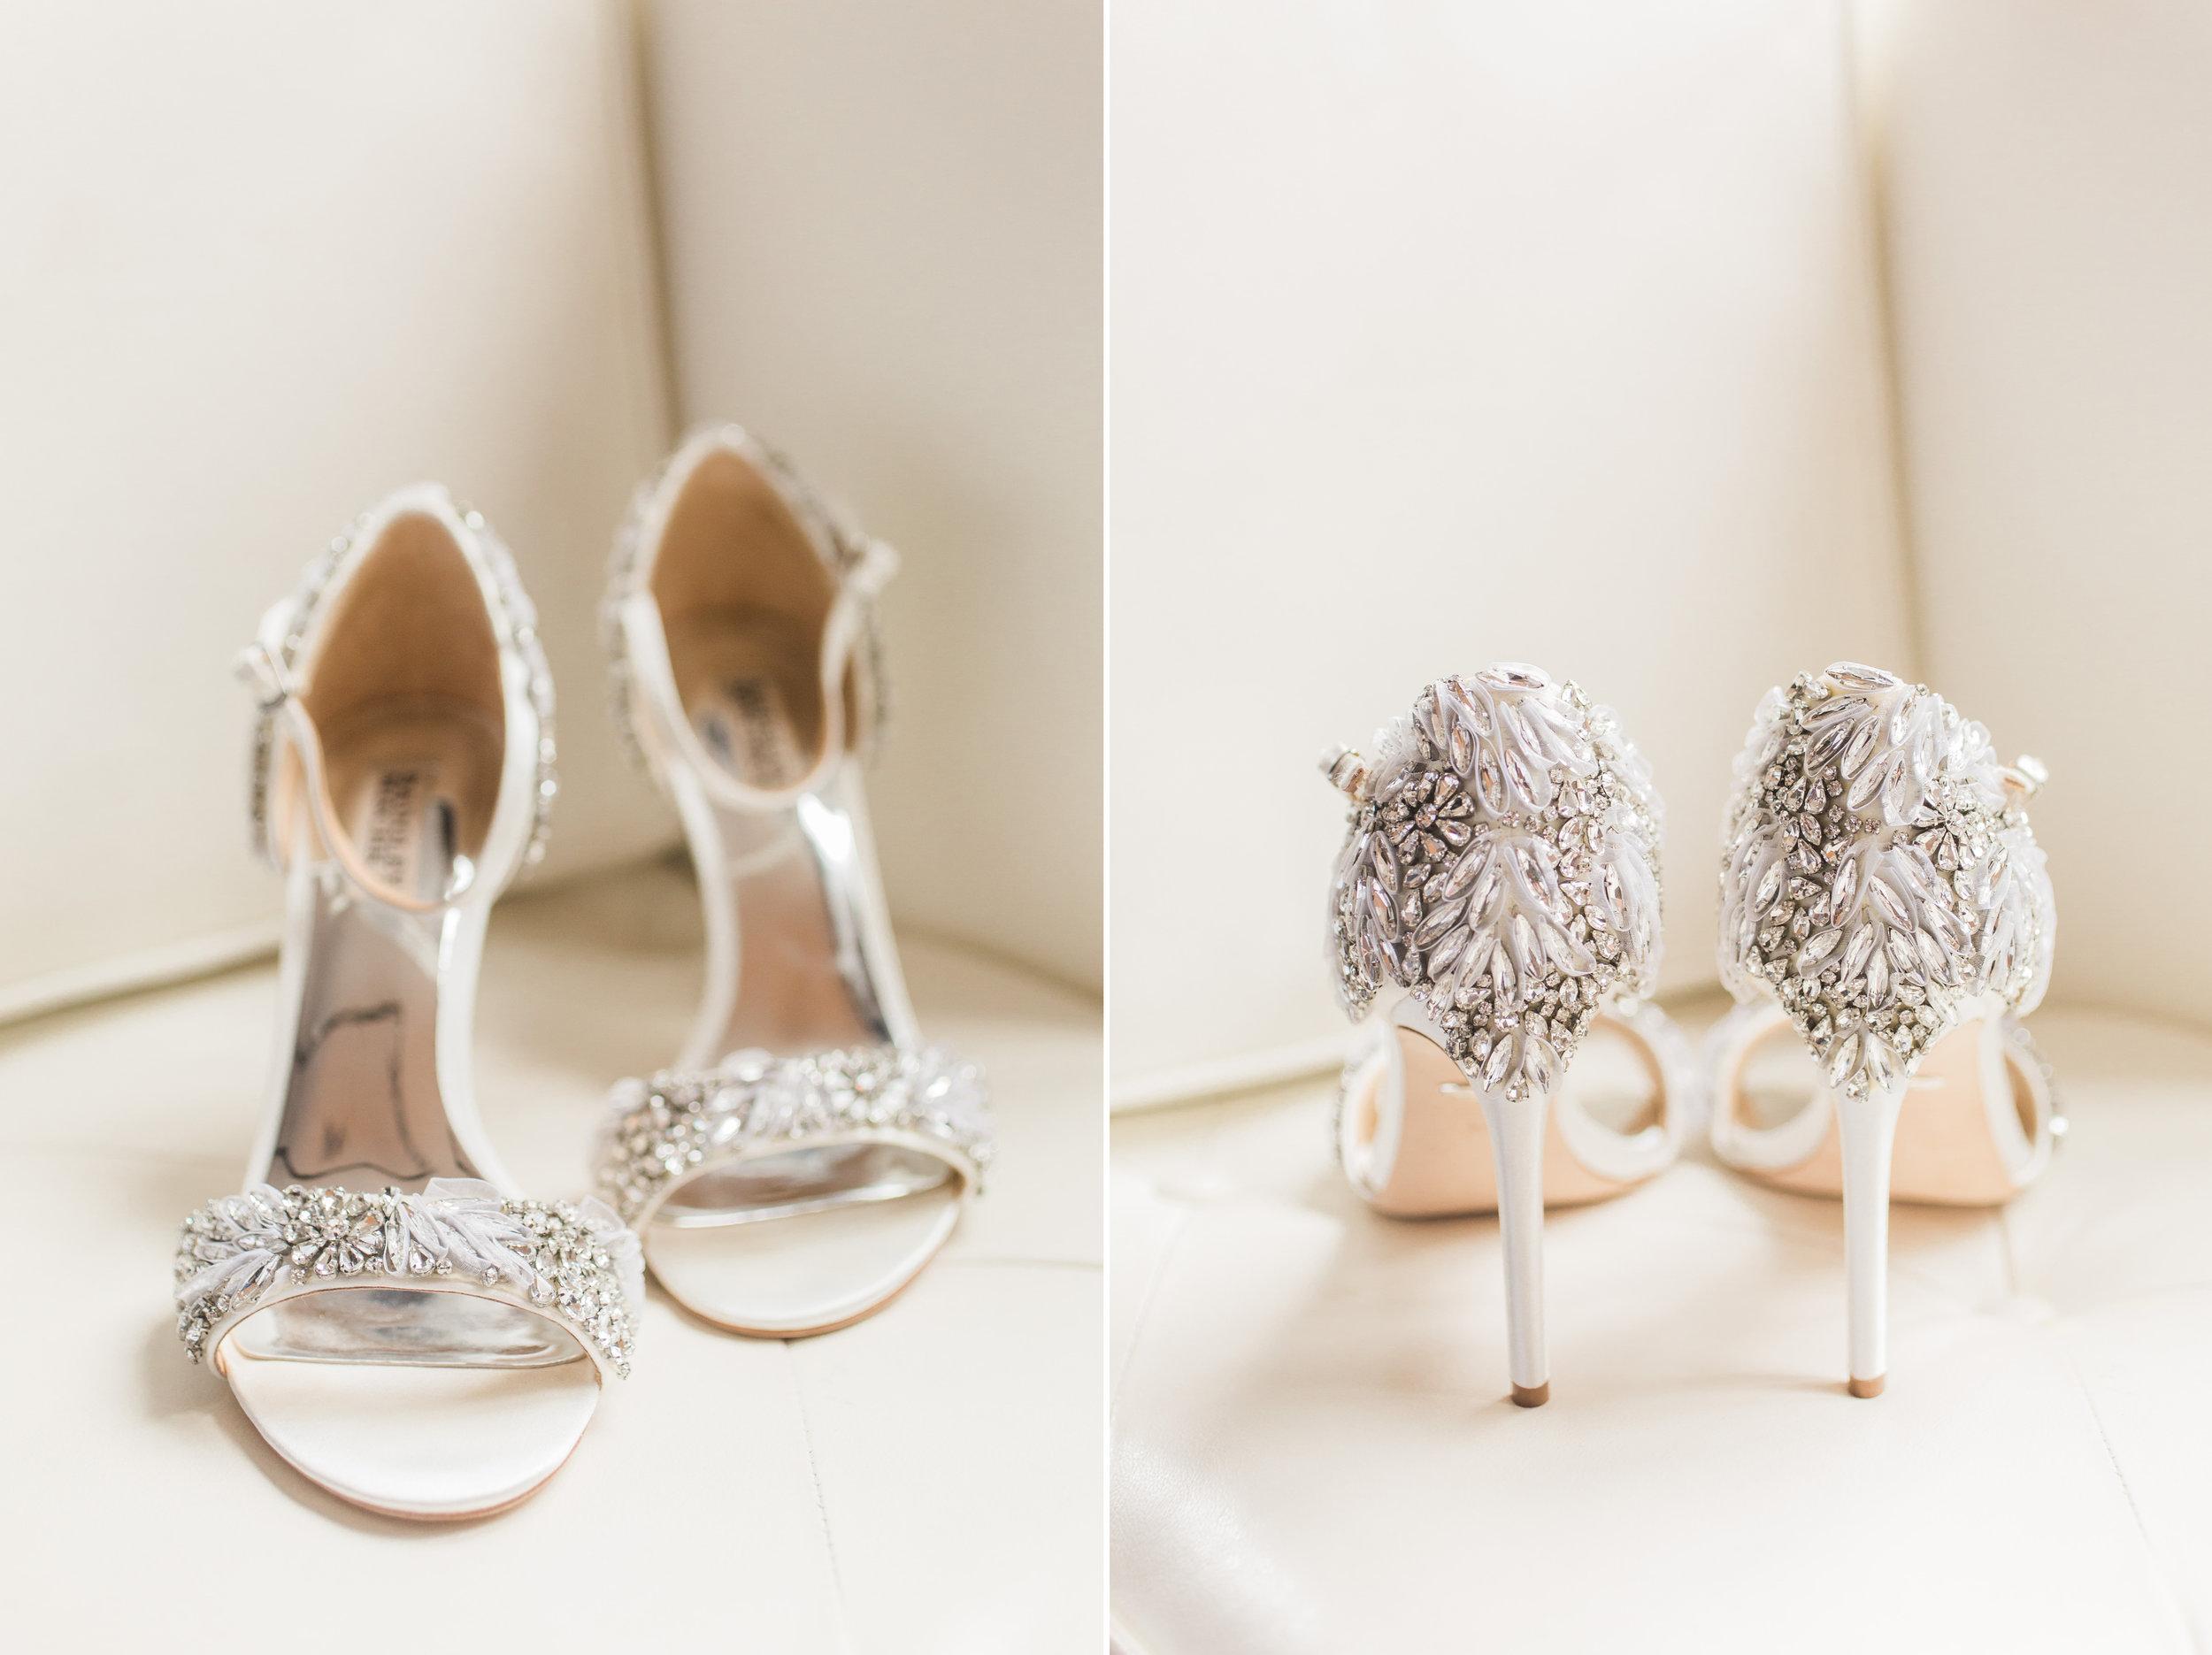 Hudson-Nichols-Black-Tie-Bride-Philadelphia-Waterworks-Wedding-Badgley-Mischka-shoes03.jpg